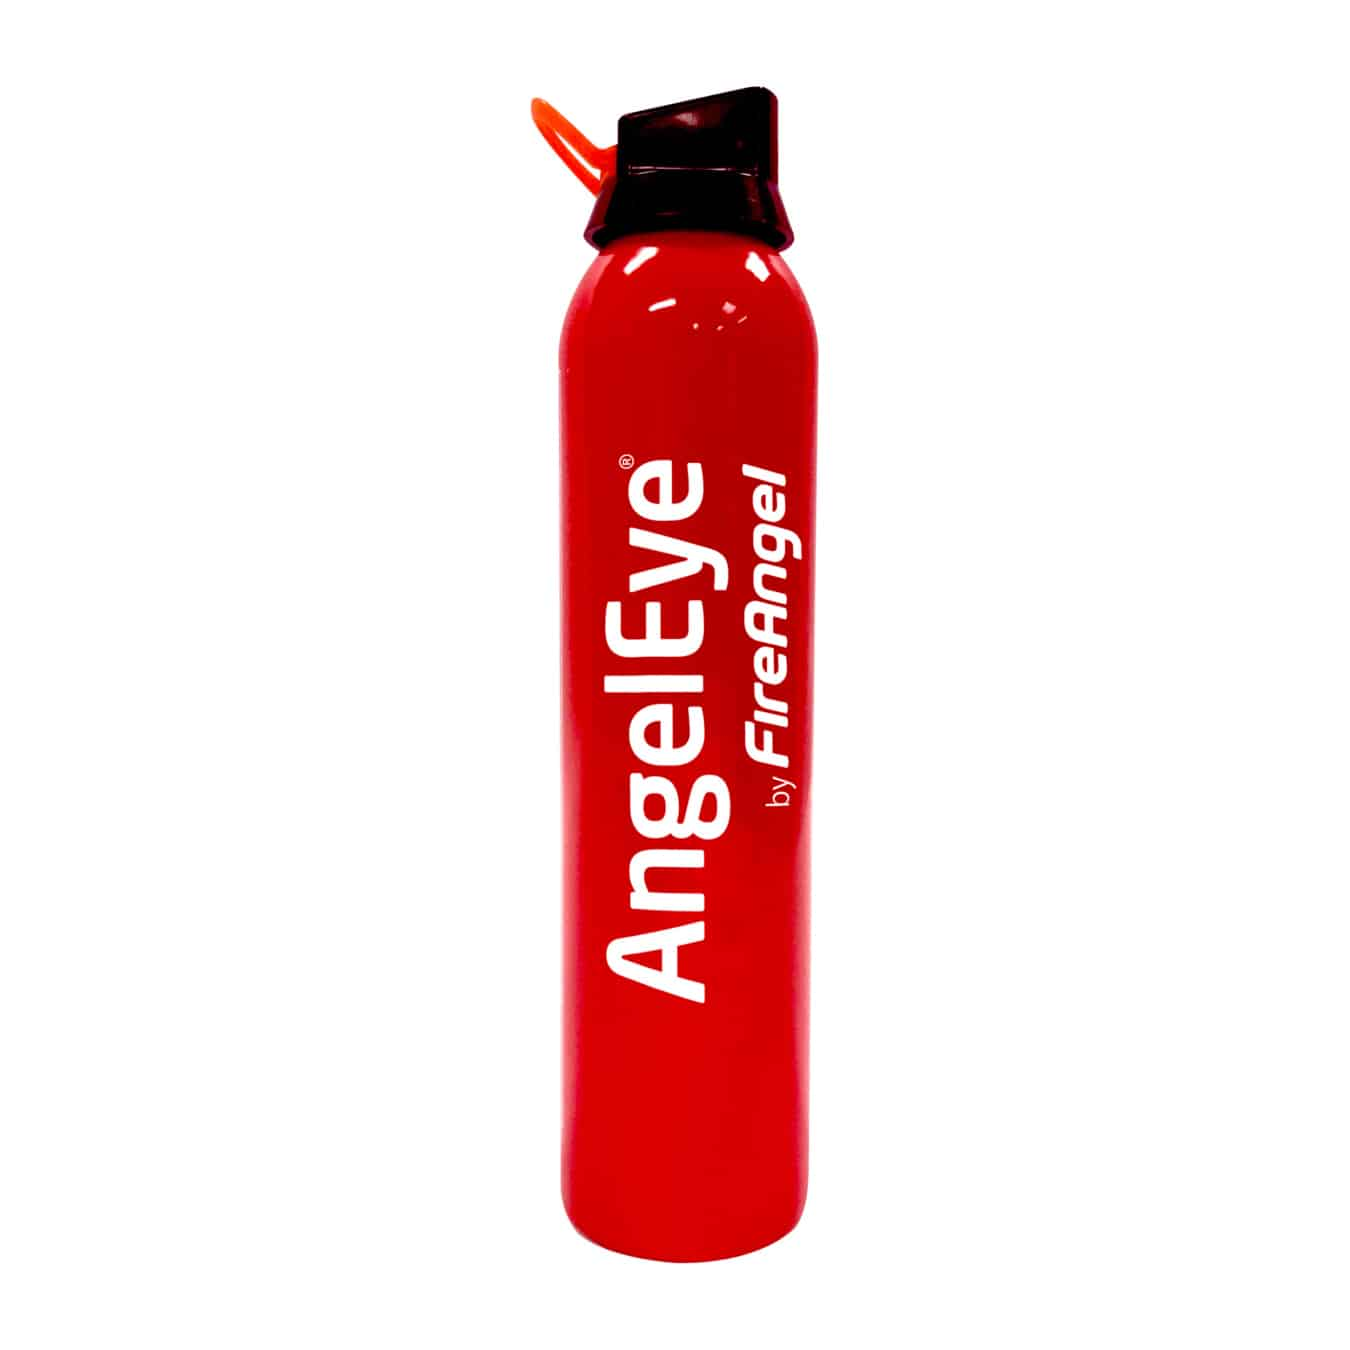 Koop AngelEye FE-600-AE sprayblusser schuim